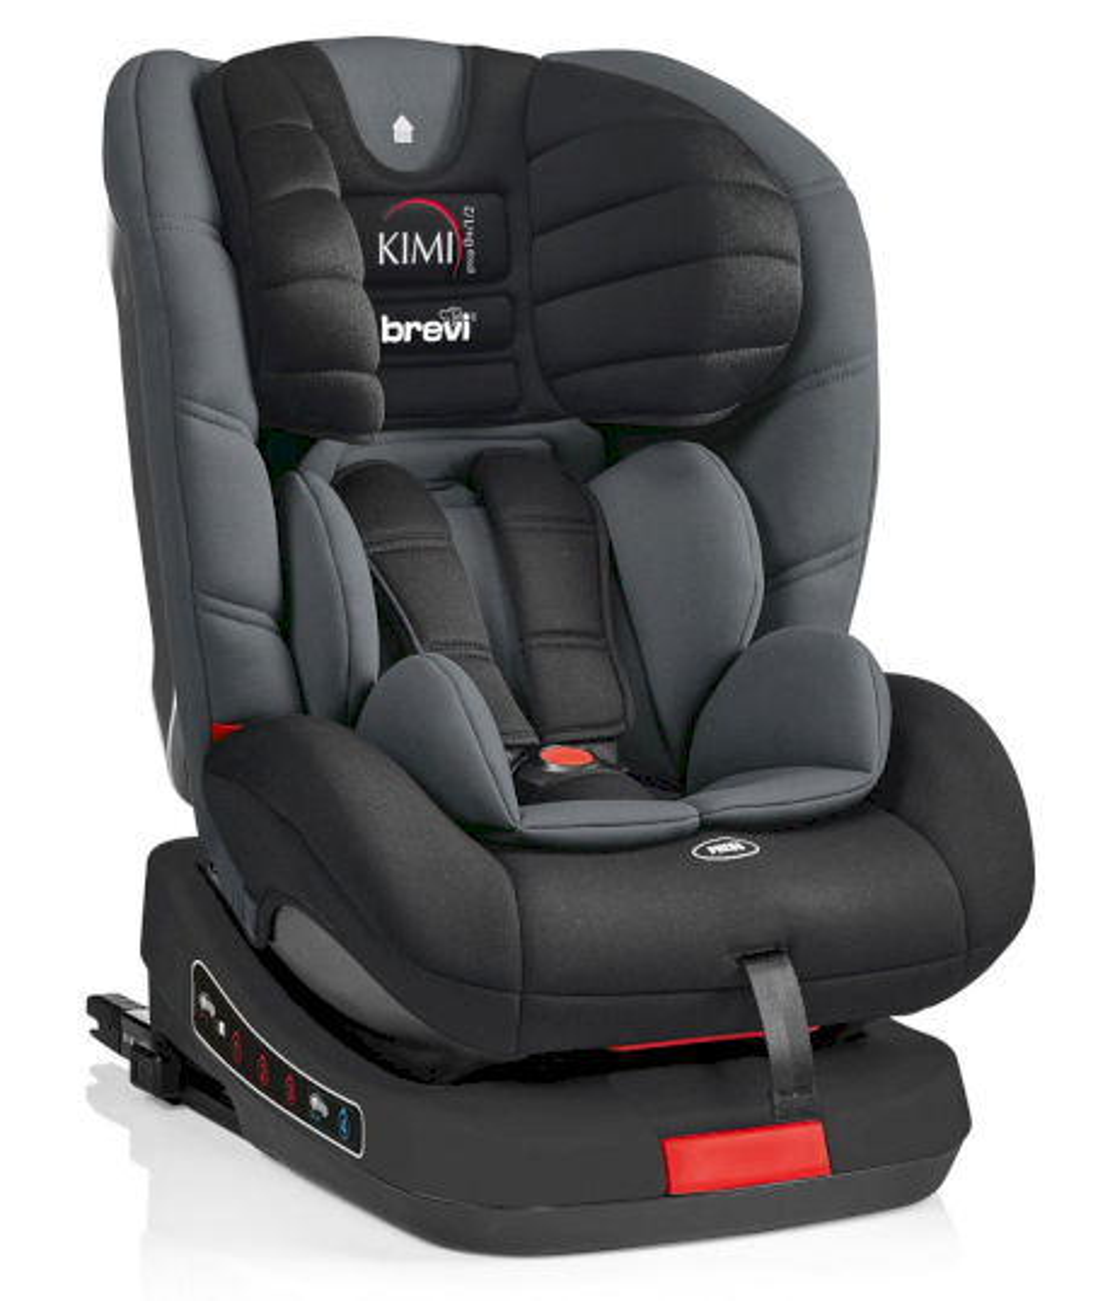 Brevi Siège-Auto Kimi Isofix